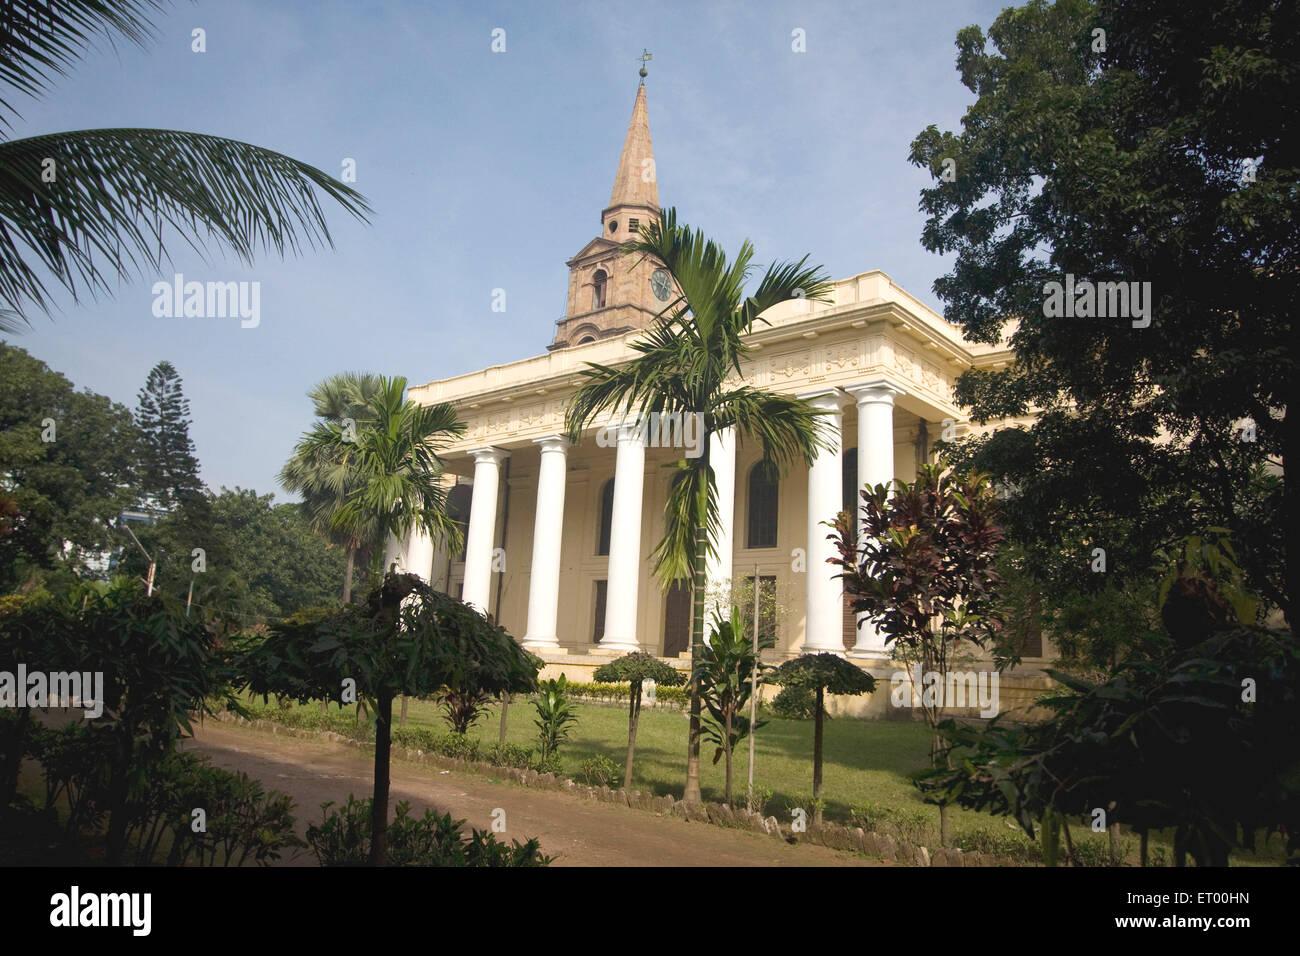 St. John church protected  monument ; Bbd Baug ; Kolkata ; West Bengal ; India Heritage - Stock Image